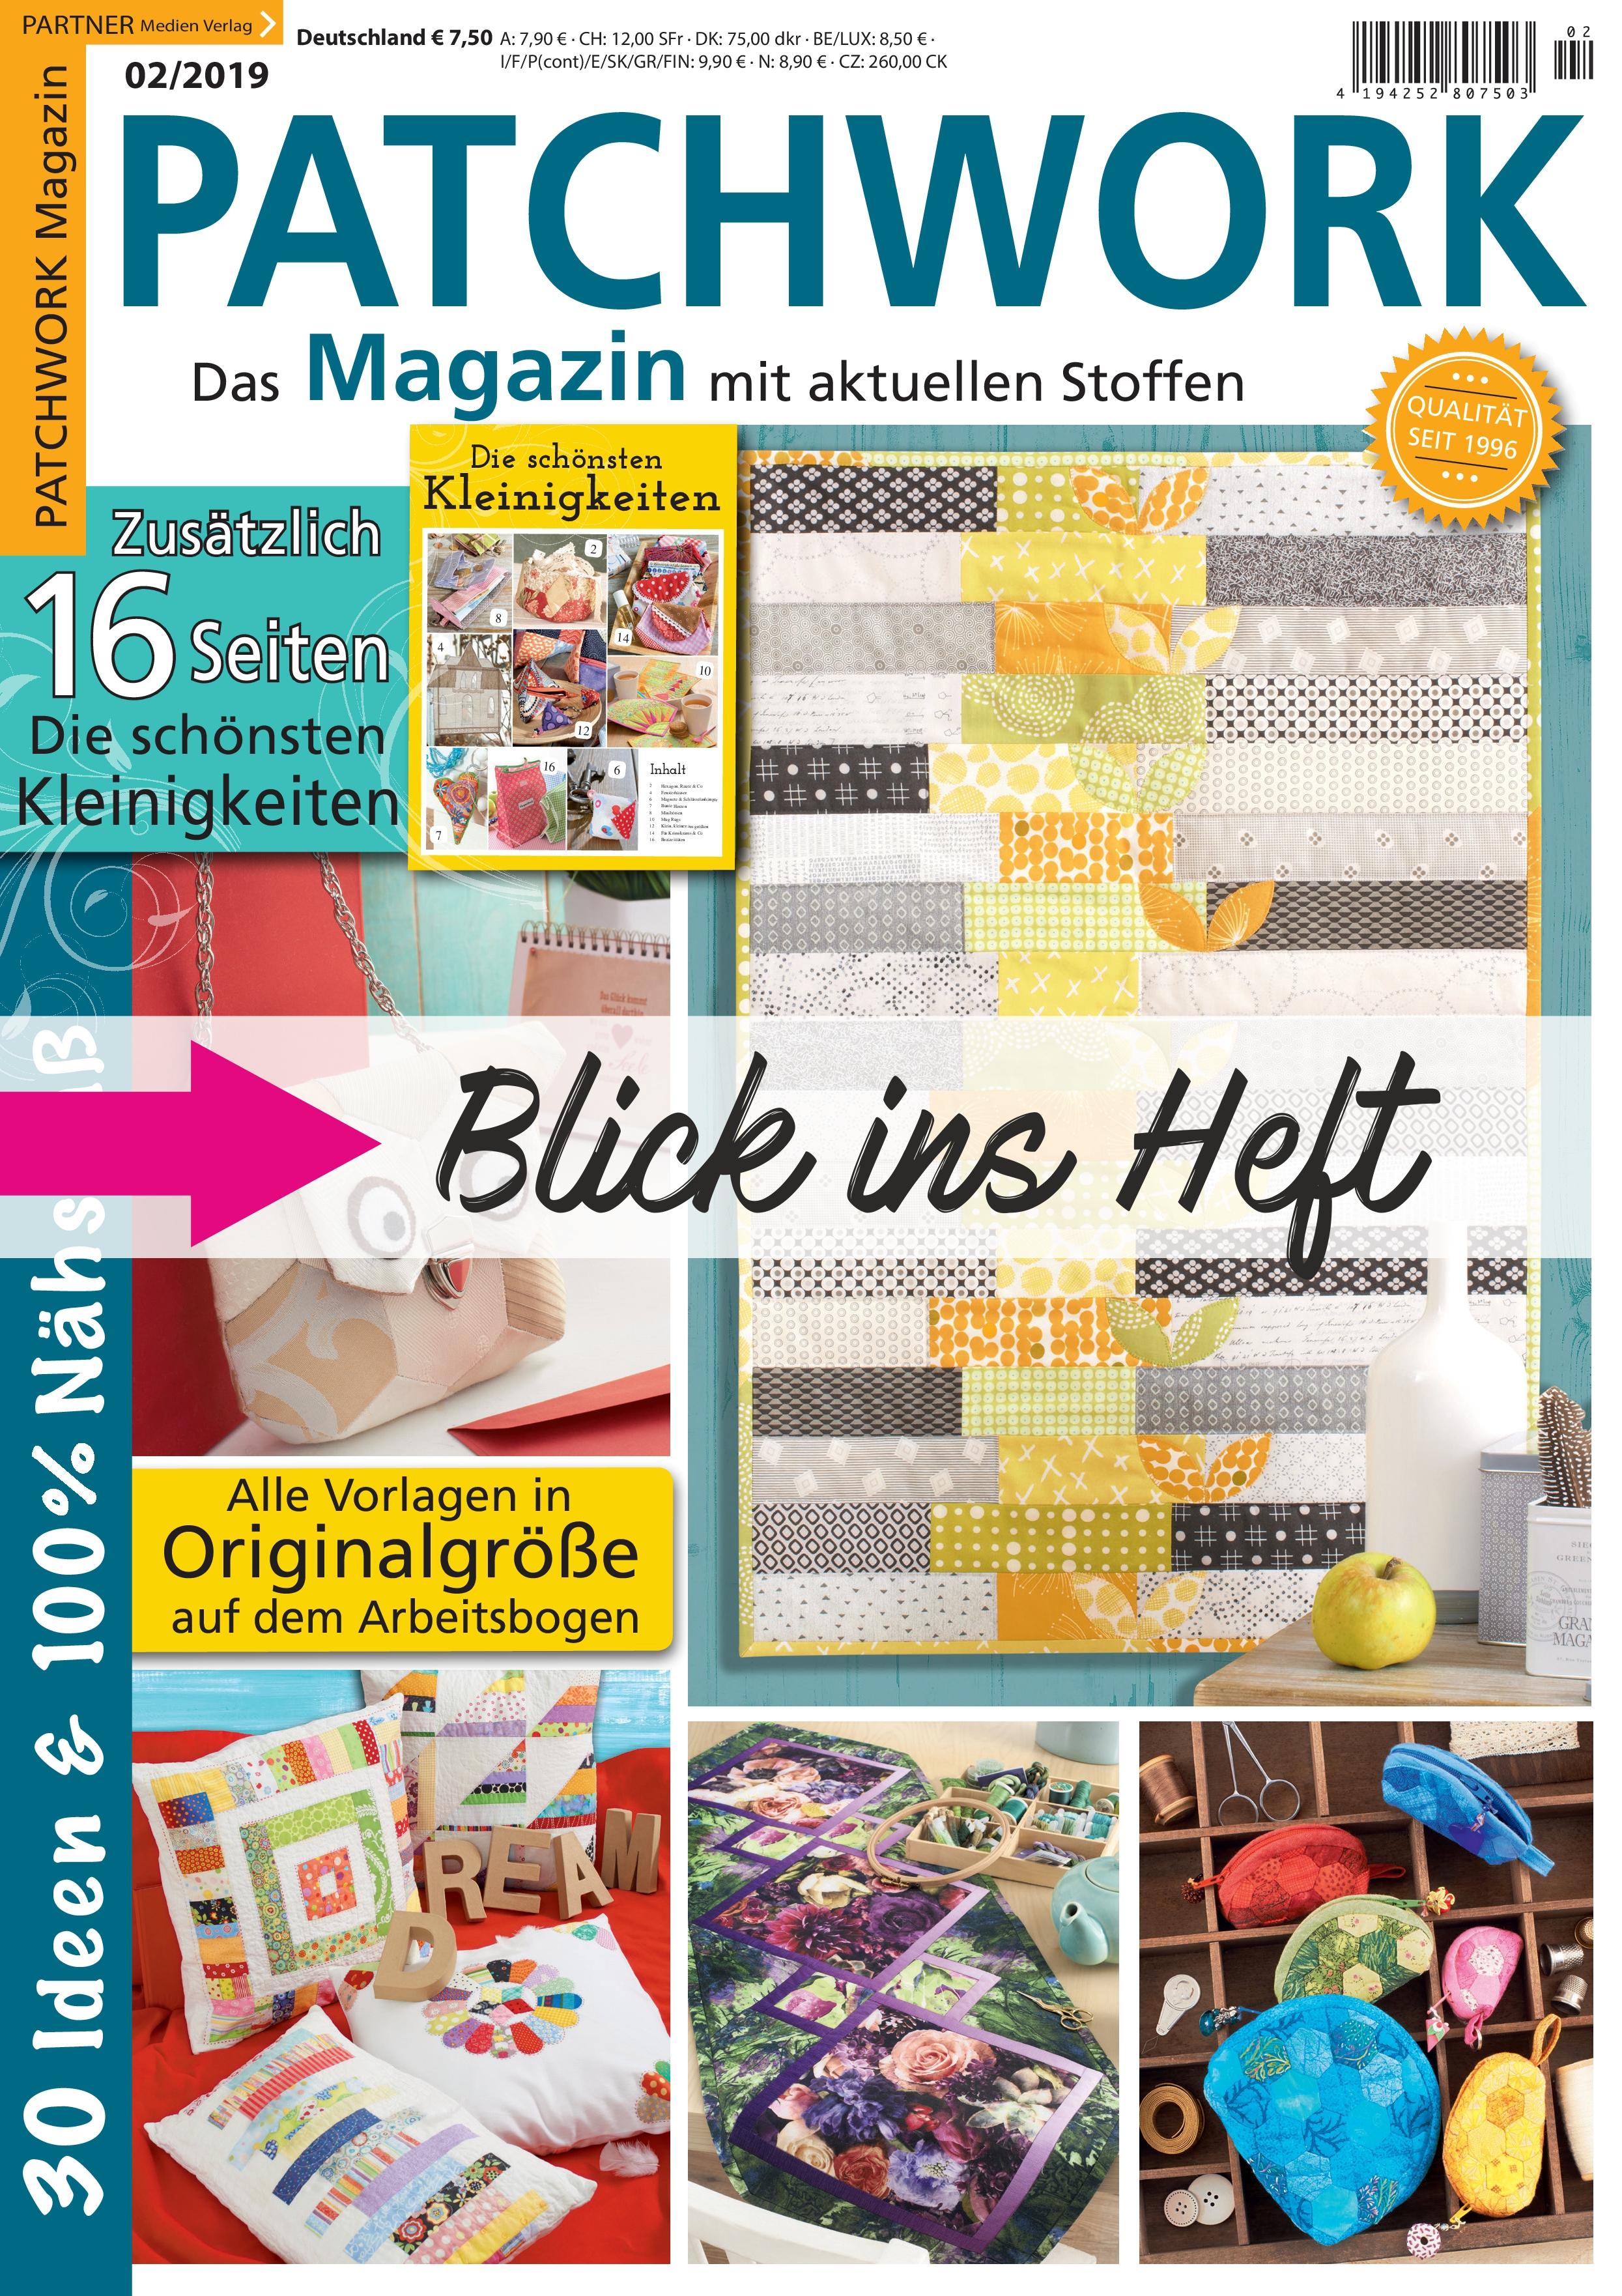 Partner Medien Verlag Patchwork Magazin